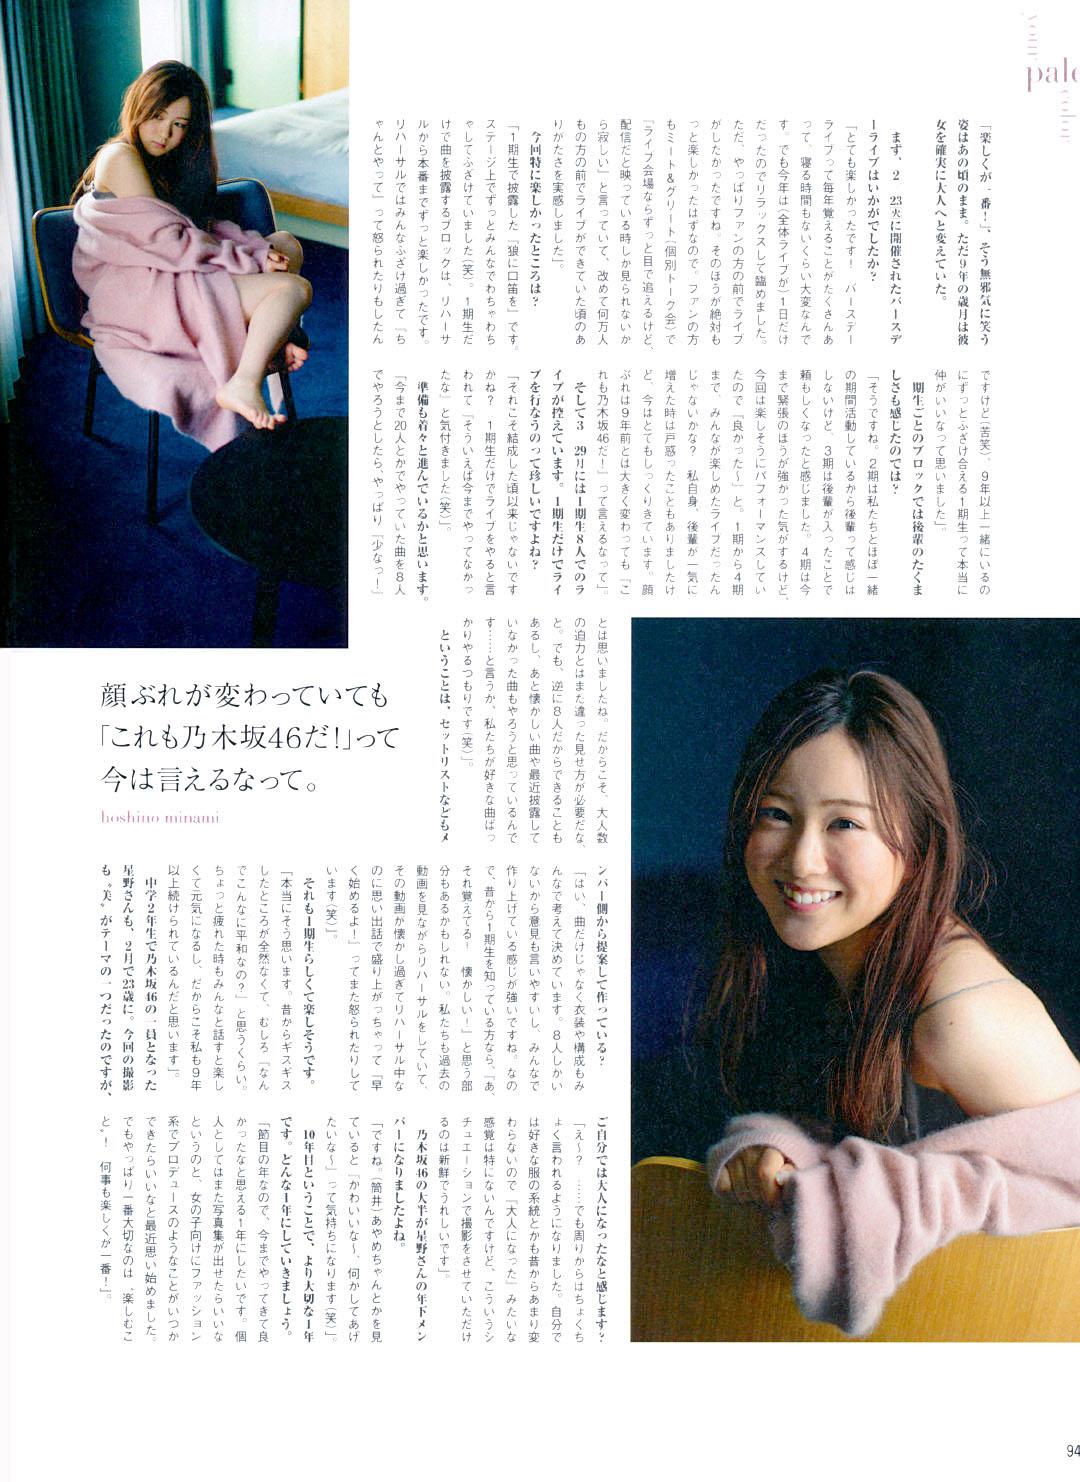 Minami Hoshino BLT Graph 2103 10.jpg